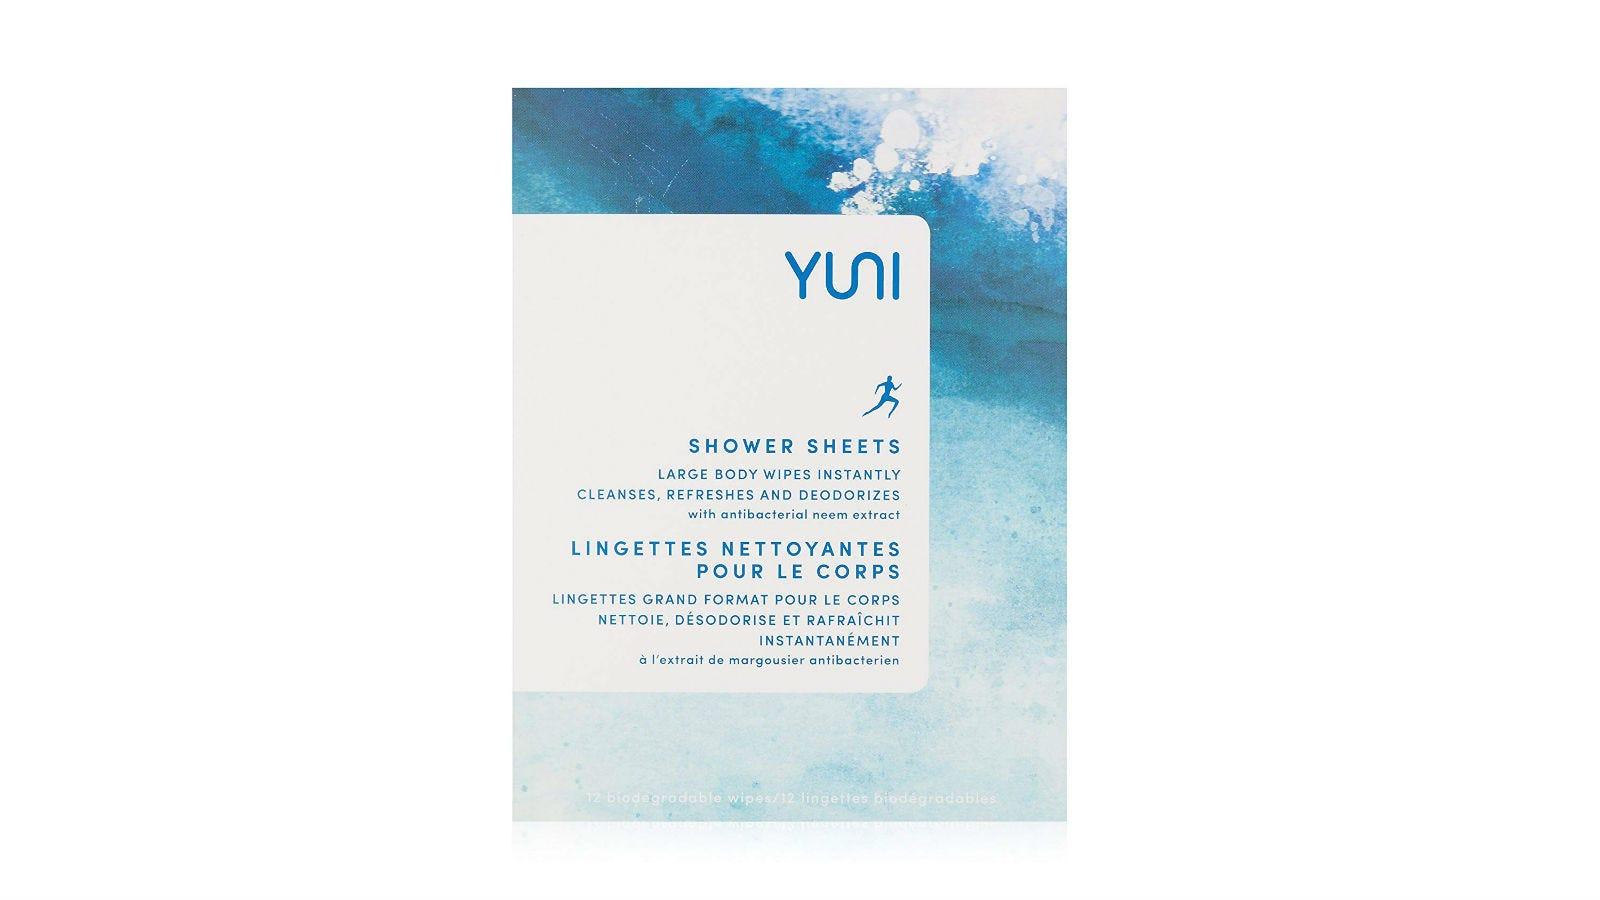 A box of YUNI Beauty Shower Sheets.